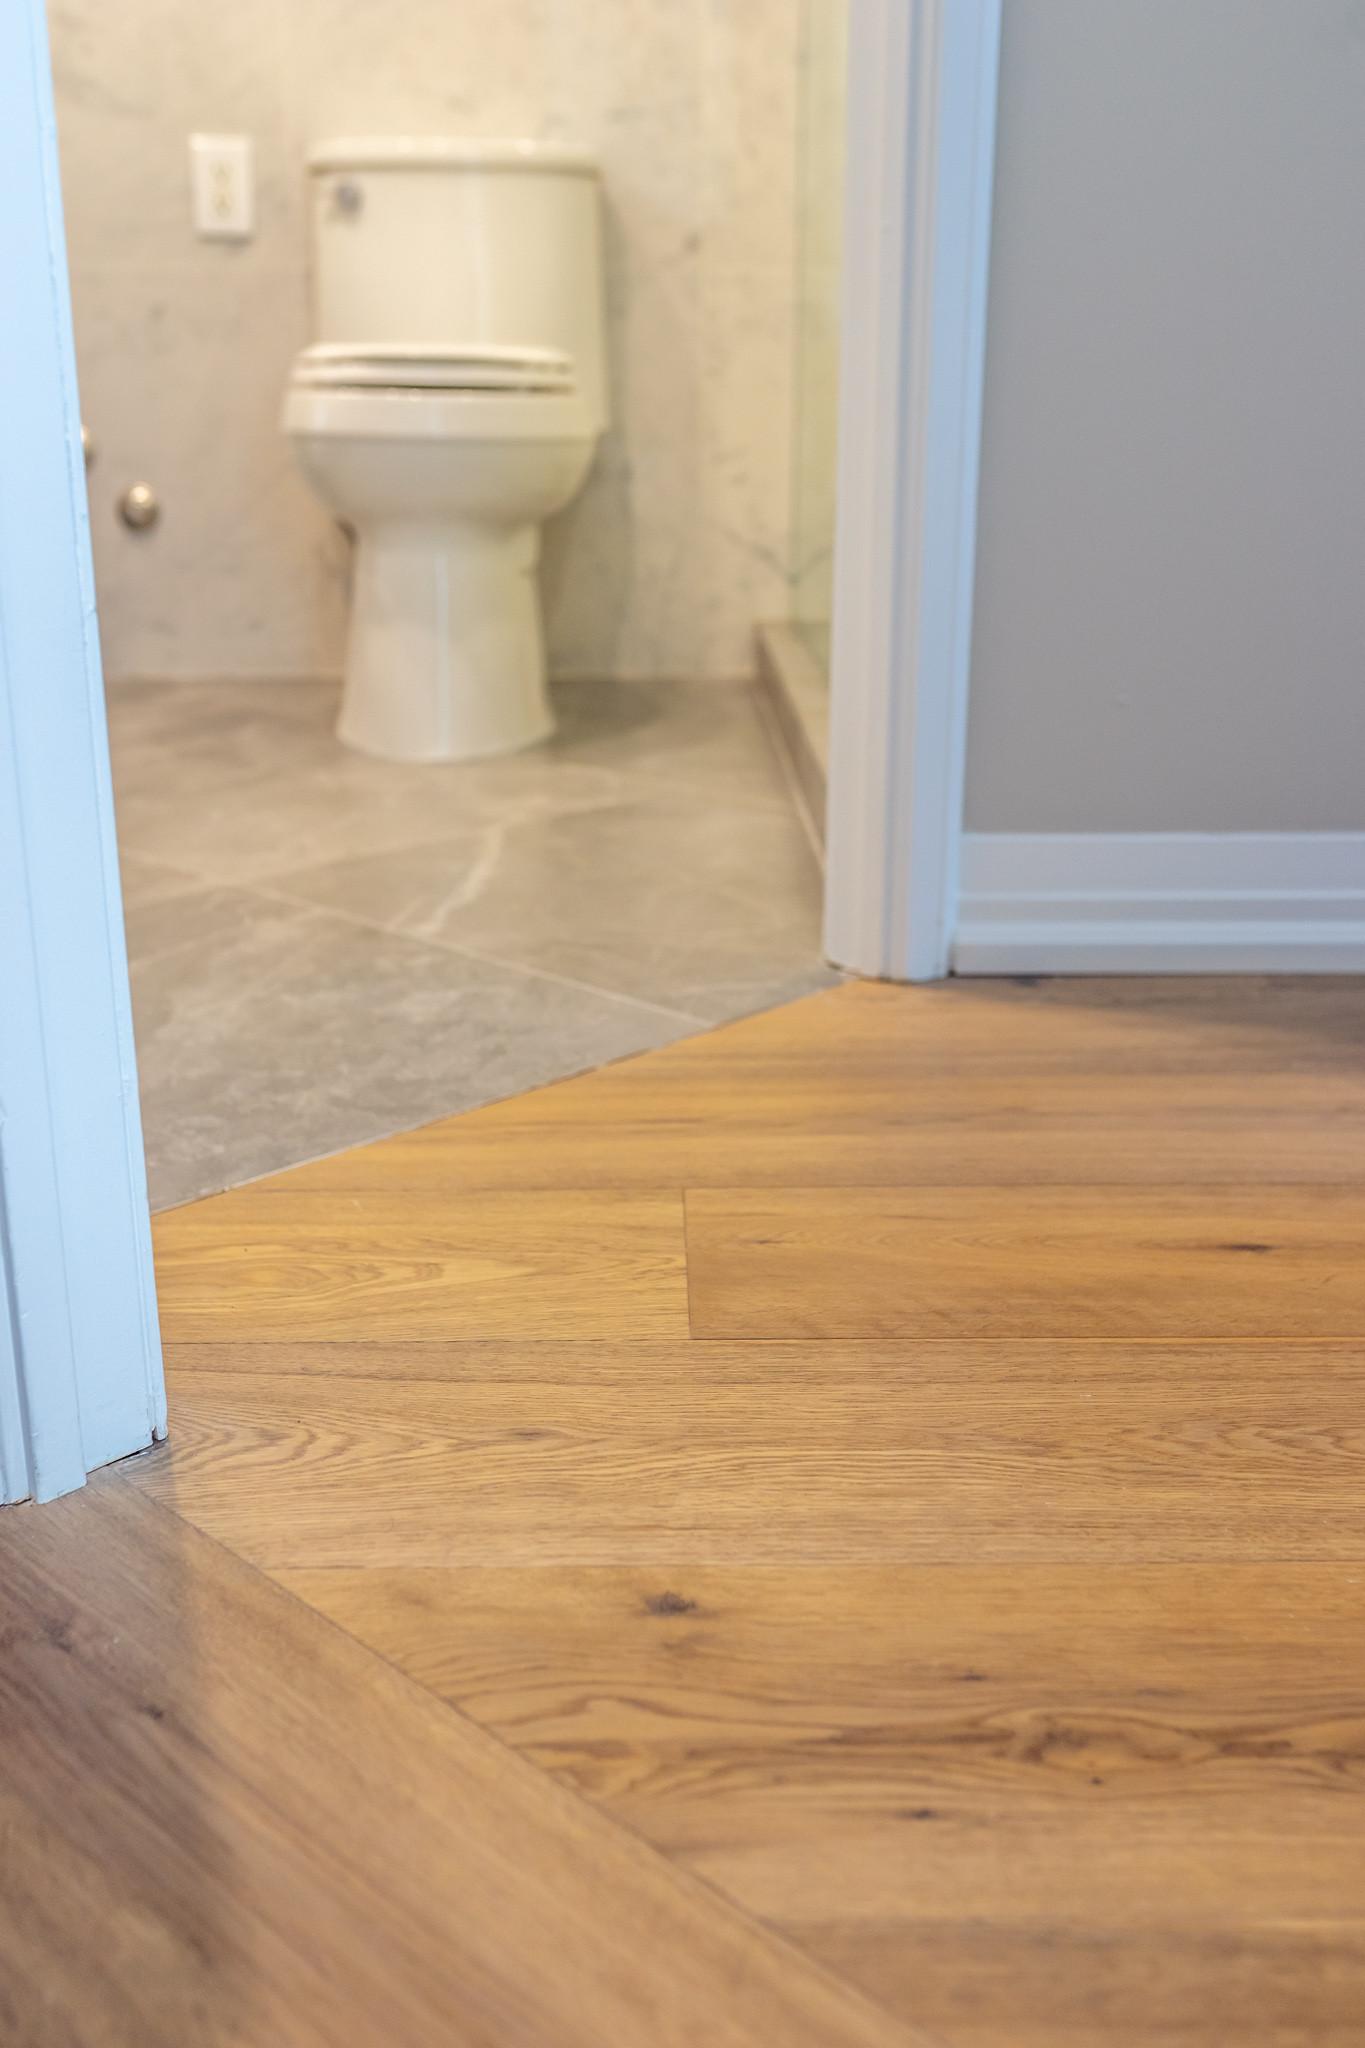 Tile/Flooring Transitions